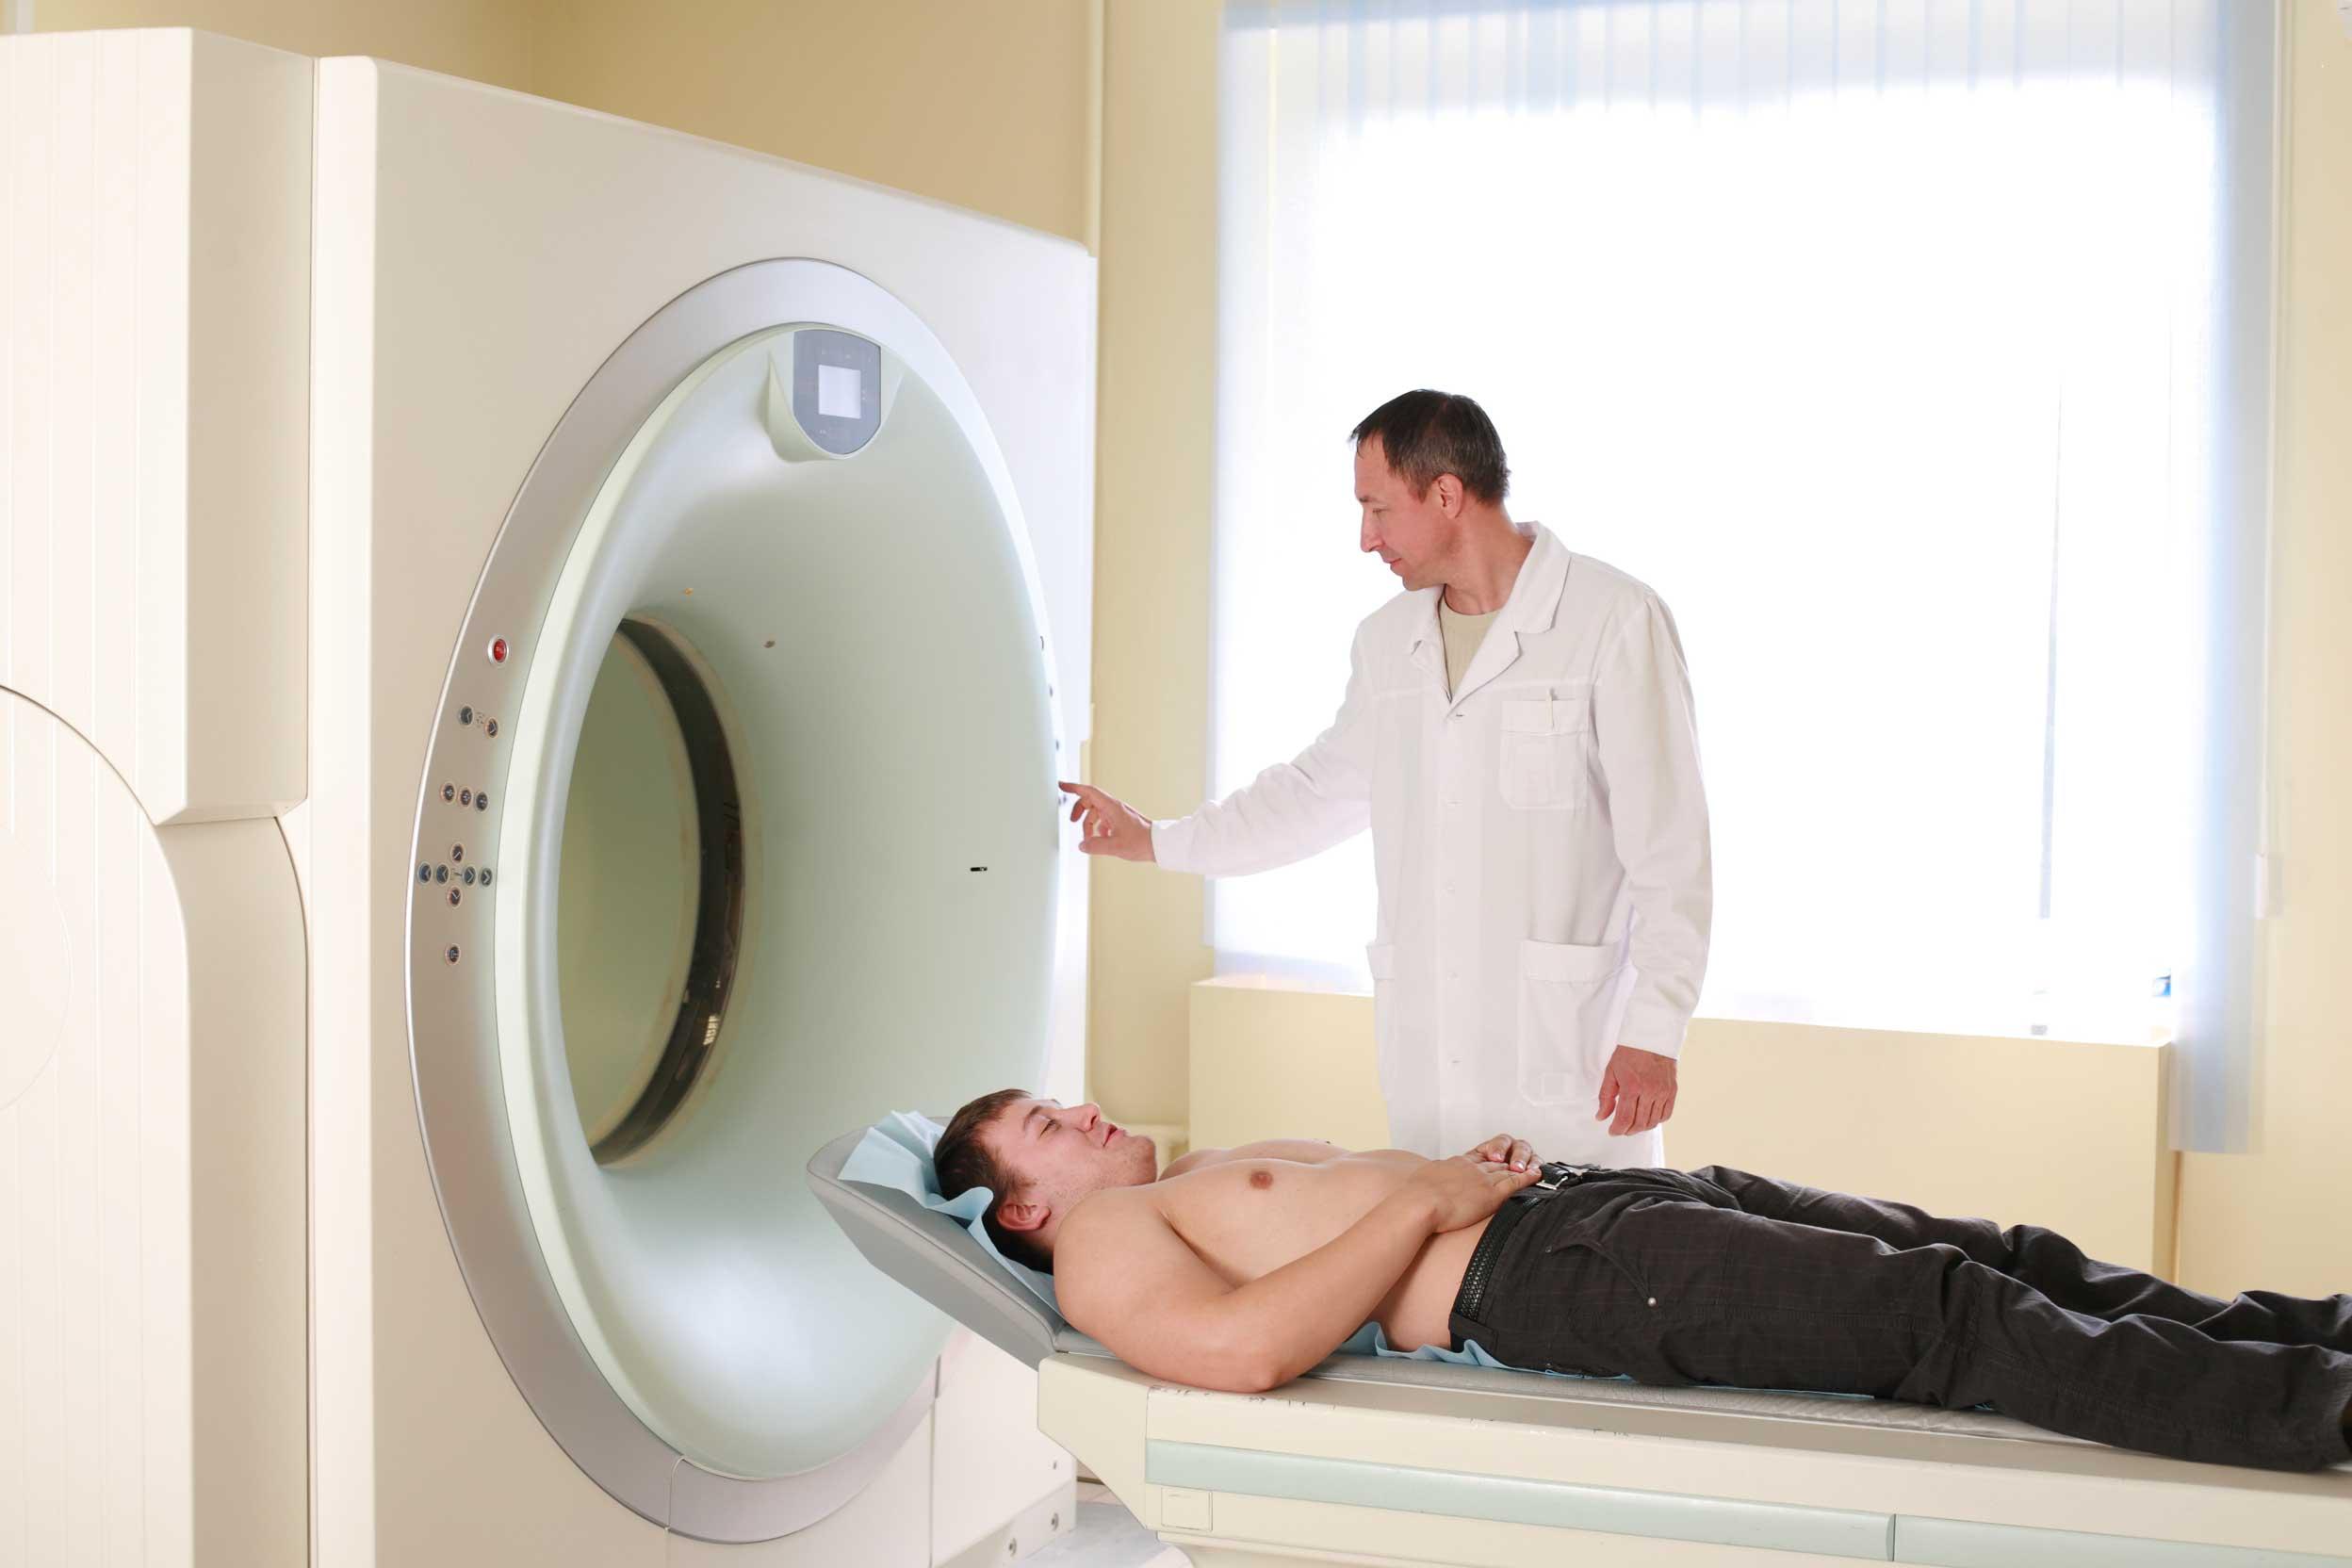 Patient preparing for CAT Scan